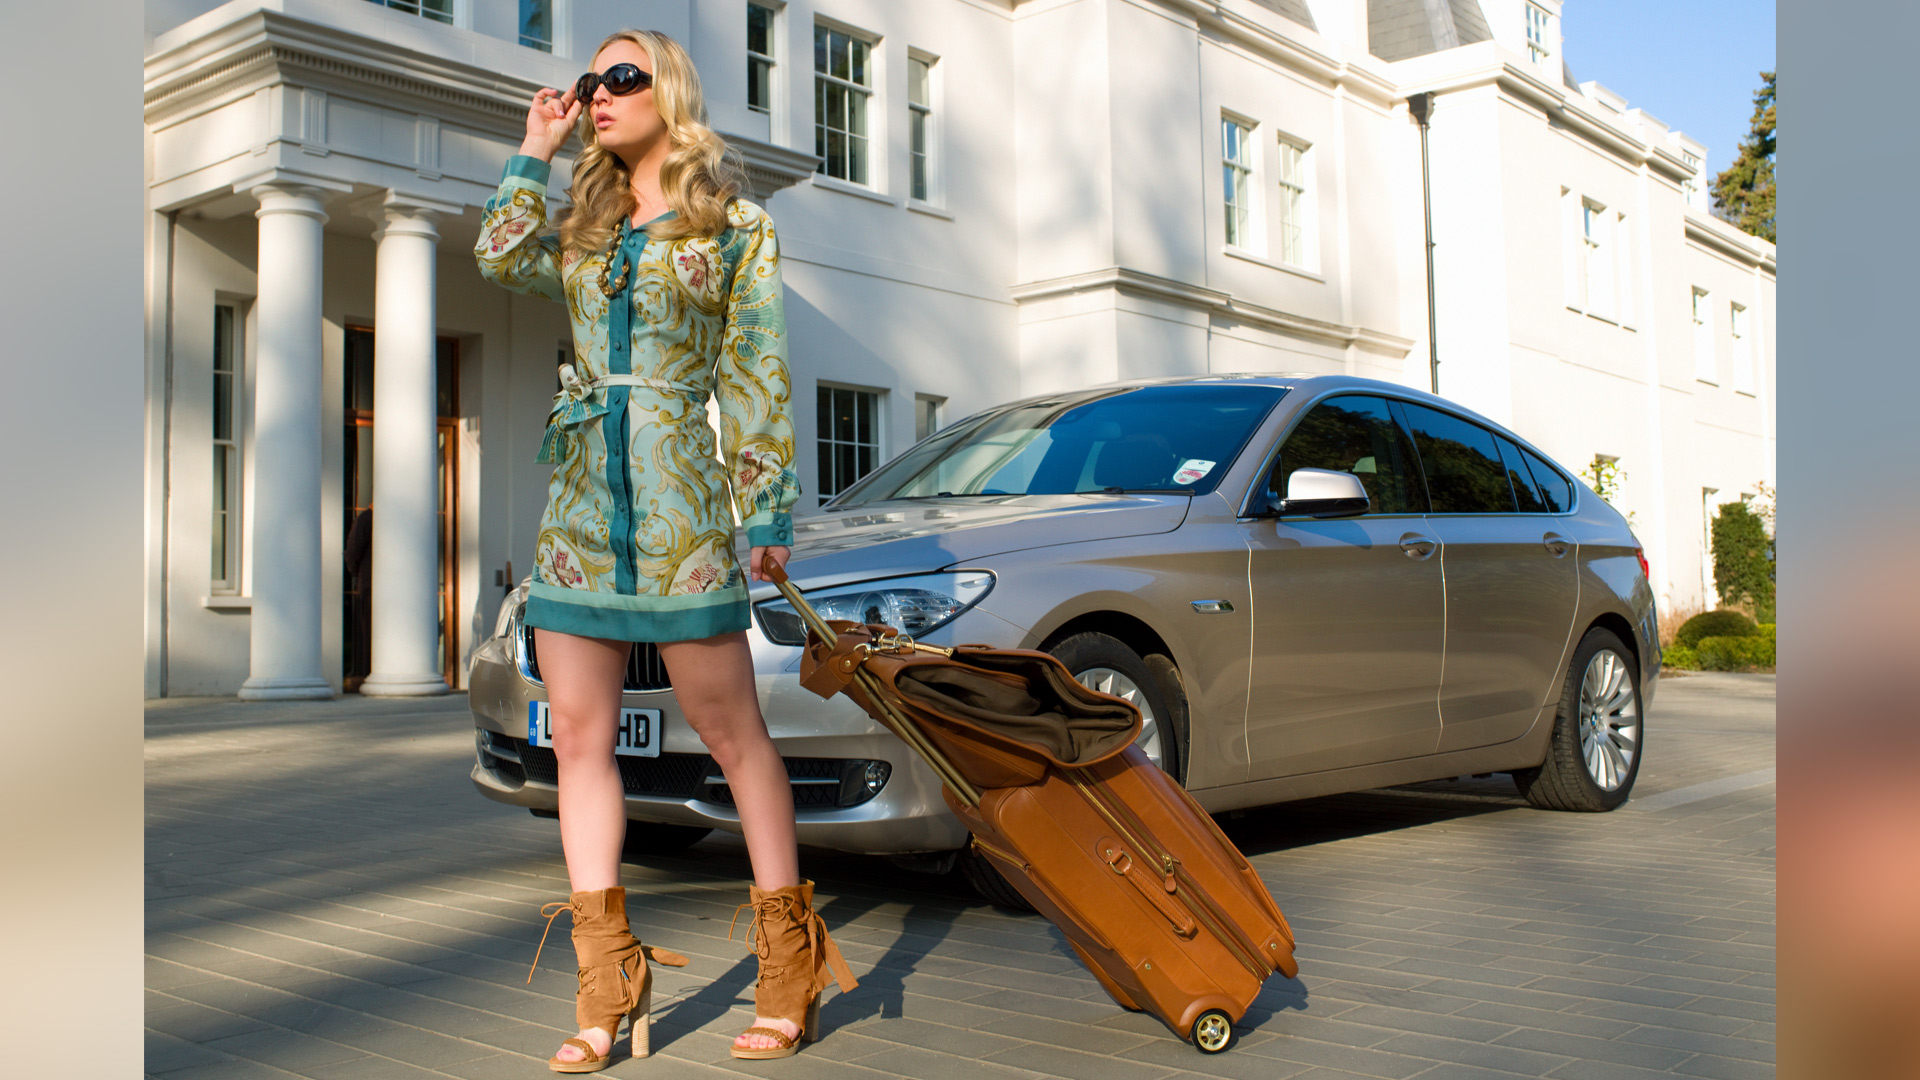 We envy Kaley Cuoco's travel style